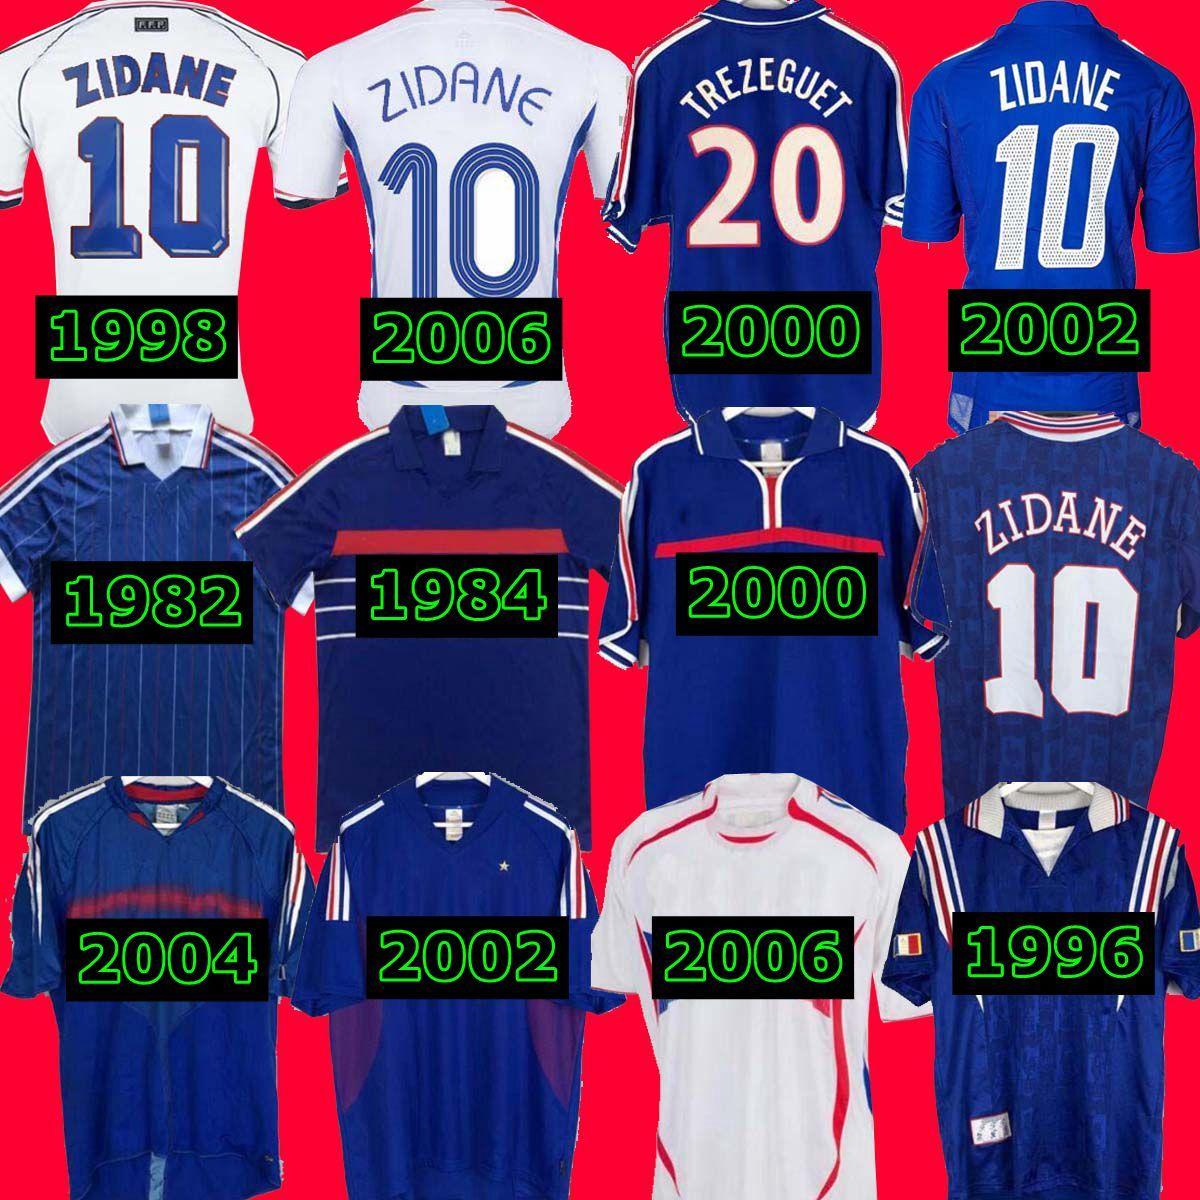 1998 2002 زيدان هنري 1996 2004 1984 Trezeguet 1982 نهائيات 2006 Deschamps 2000 2010 فرنسا ريترو لكرة القدم جيرسي مايلوت دي كومفوفالي